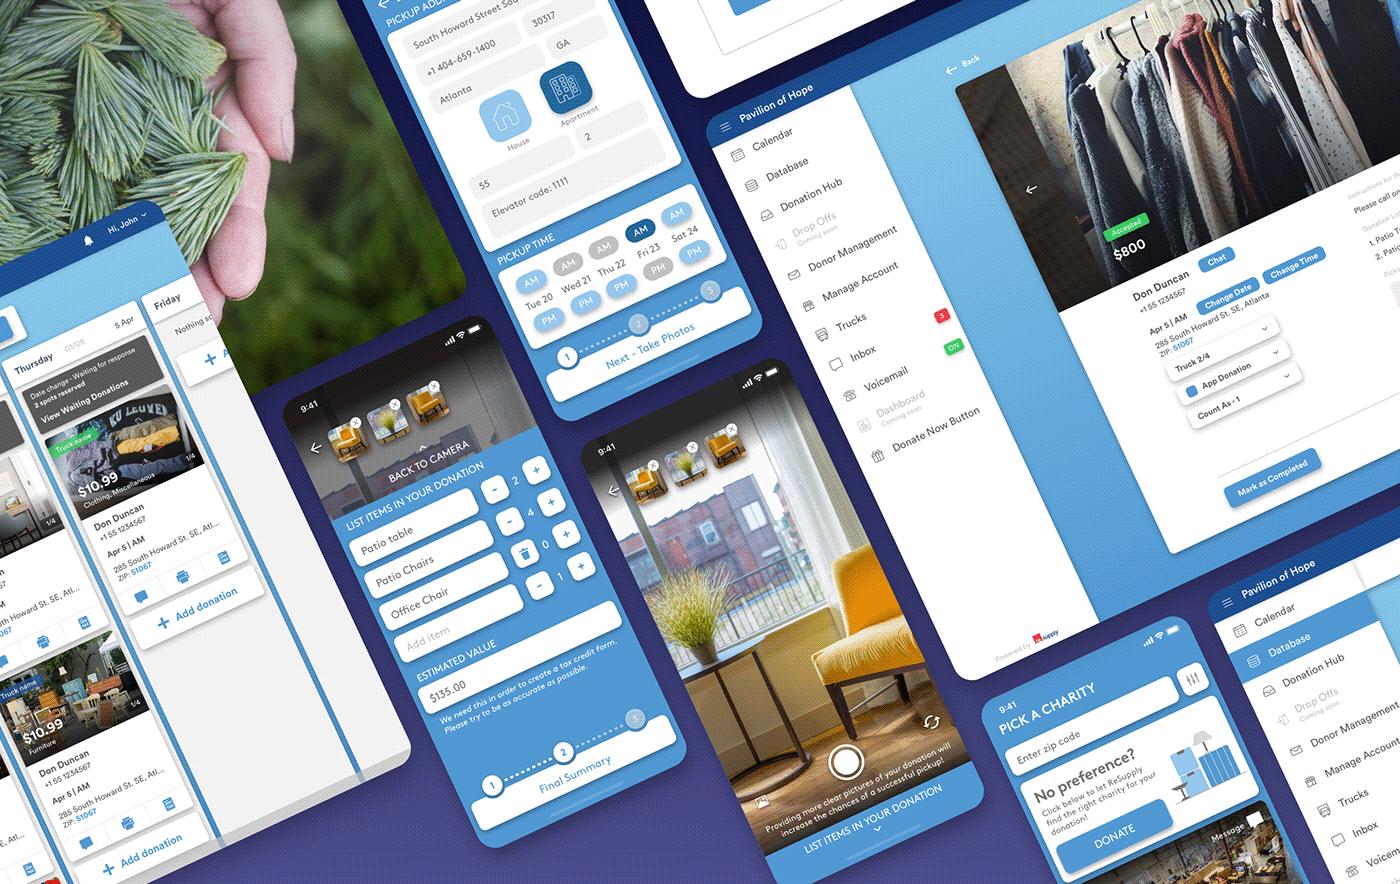 Image may contain: screenshot, indoor and computer